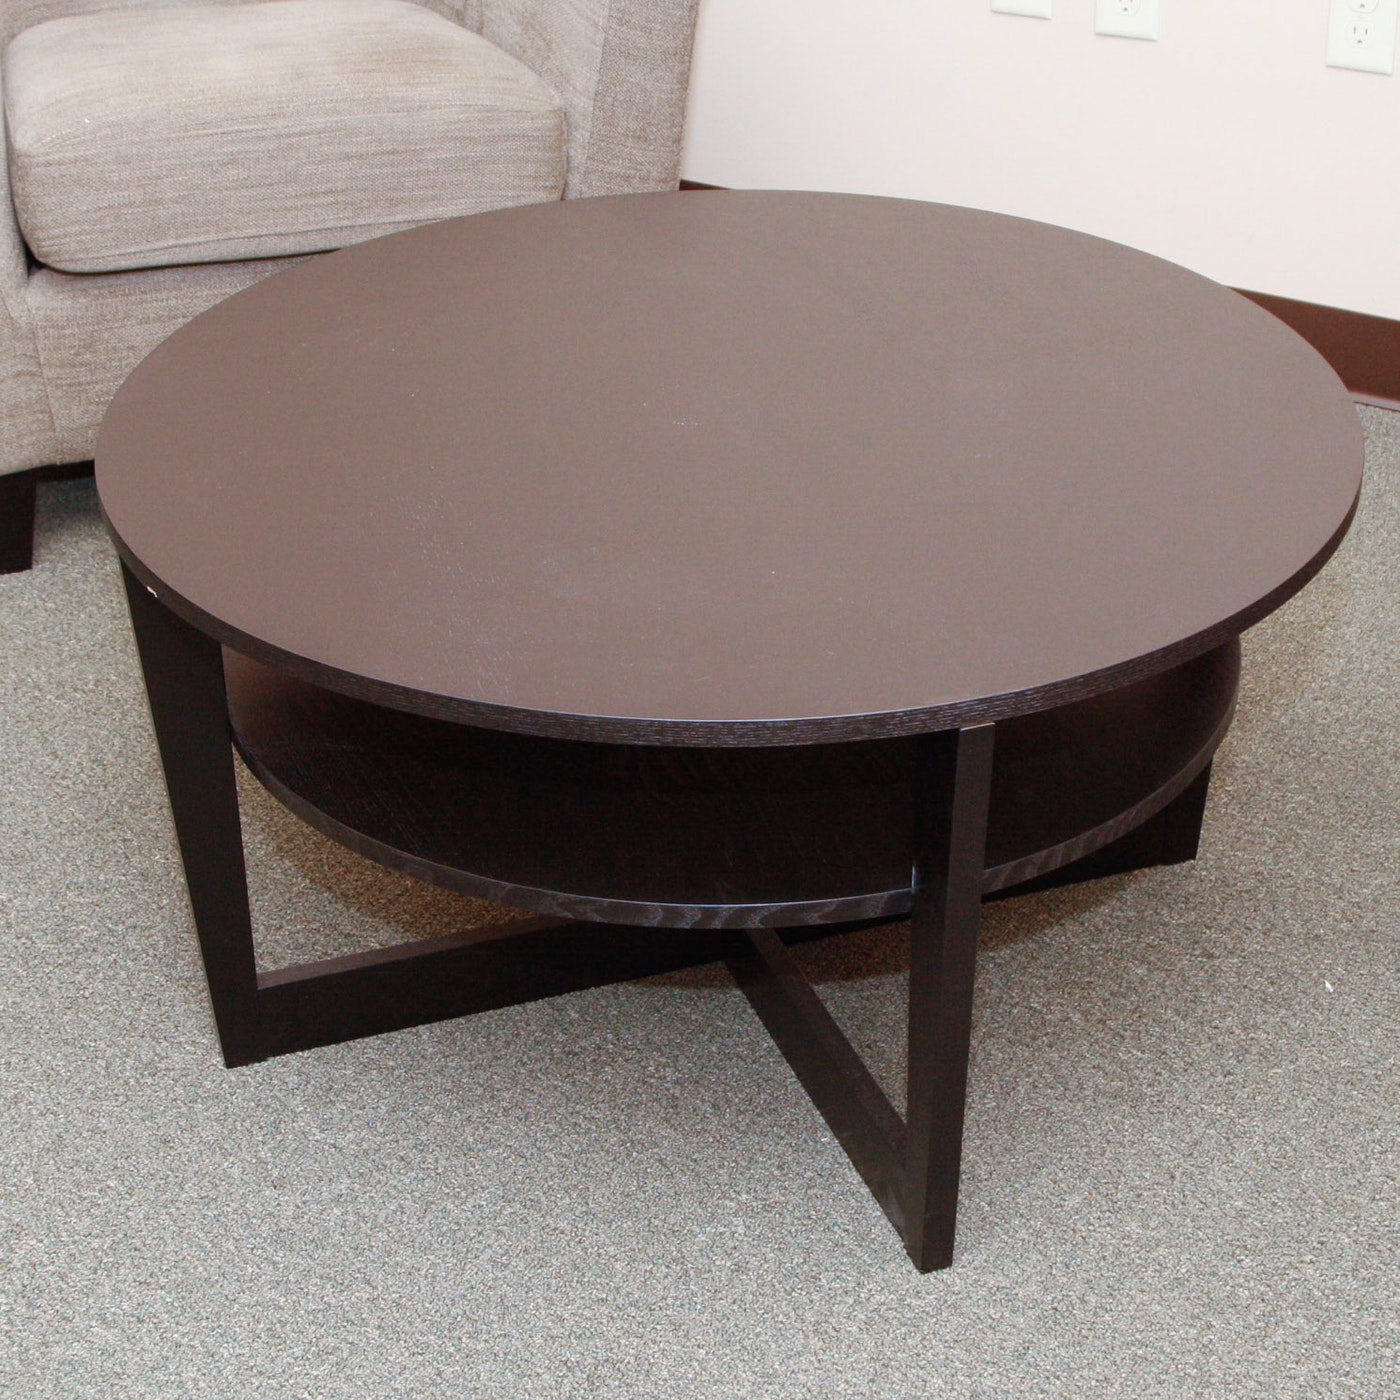 IKEA Vejmon Round Coffee Table with Shelf | EBTH